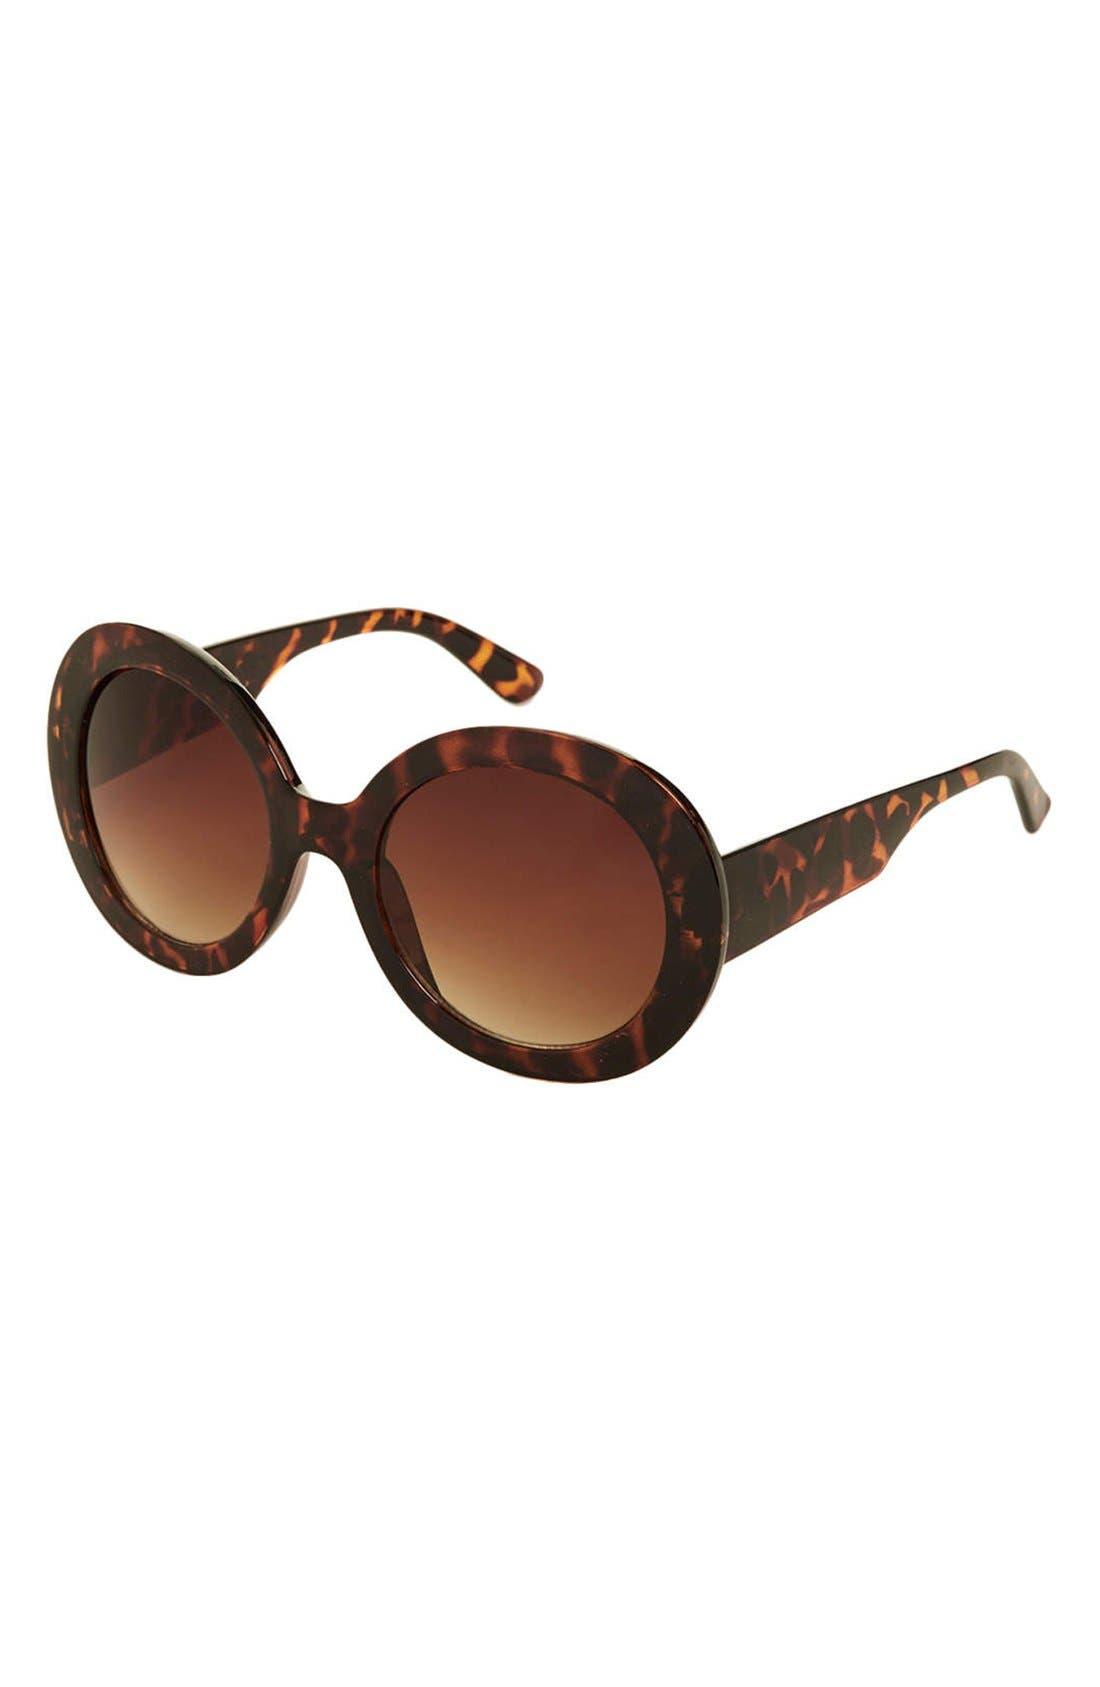 Main Image - Topshop 'Petra' 54mm Oversized Round Sunglasses